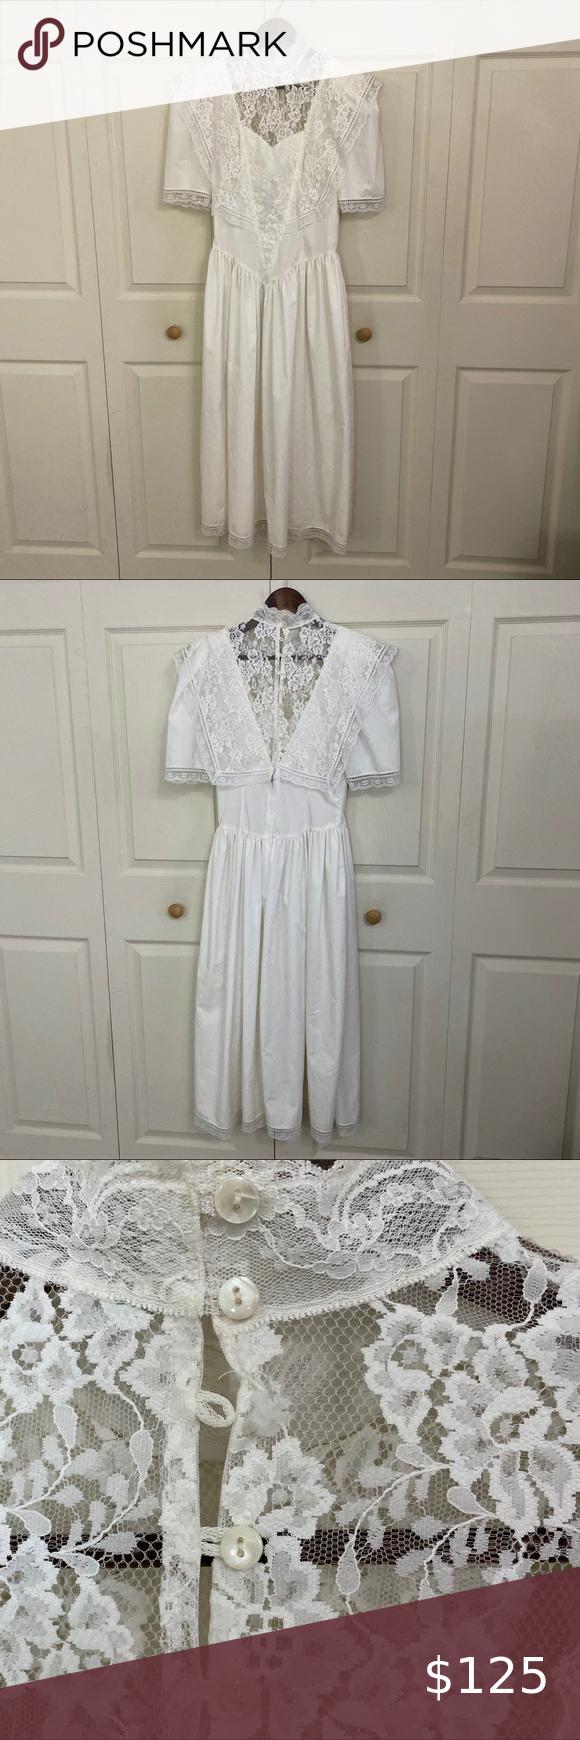 Vintage White Lace Cottage Core Dress Flowy White Dress Missing One Button See Back 28 Waist Lace Farm Cor White Flowy Dress Cottage Core Dress Lace Midi [ 1740 x 580 Pixel ]